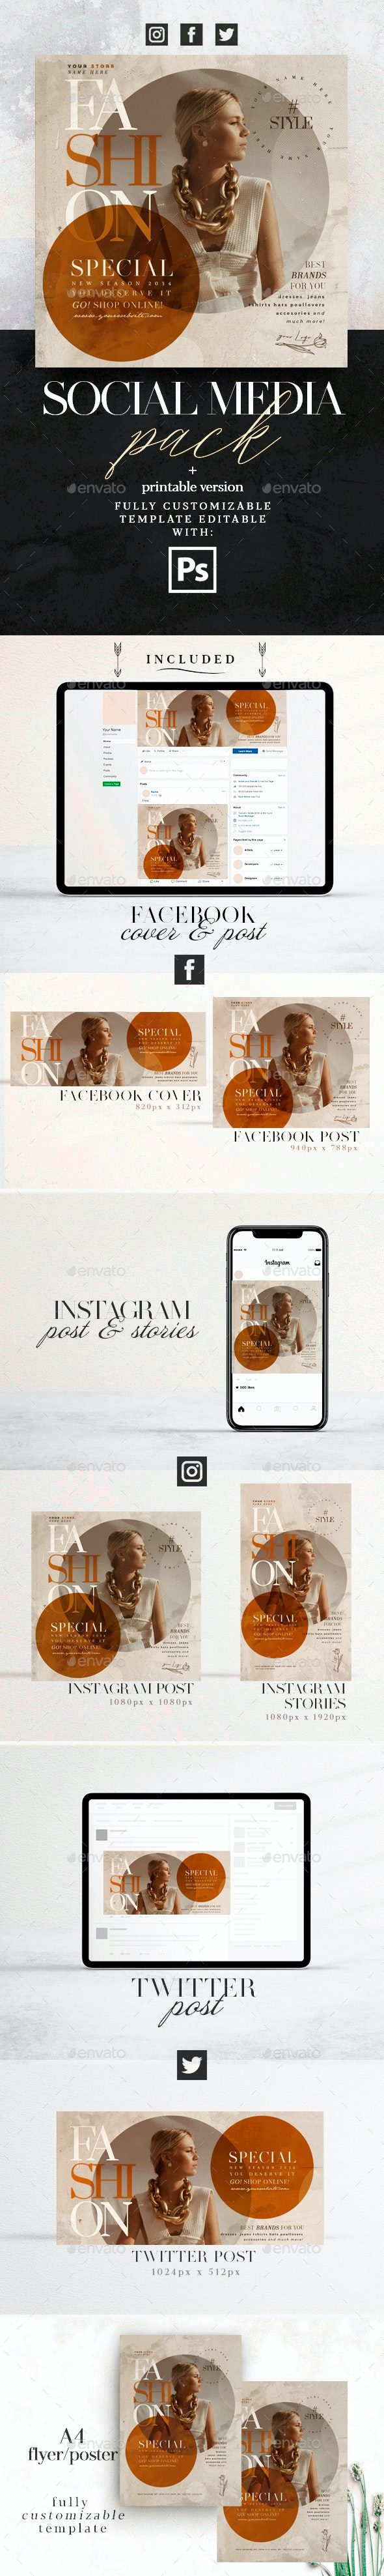 Fashion Special - Social Media Pack + Flyer Template - Social Media Web Elements